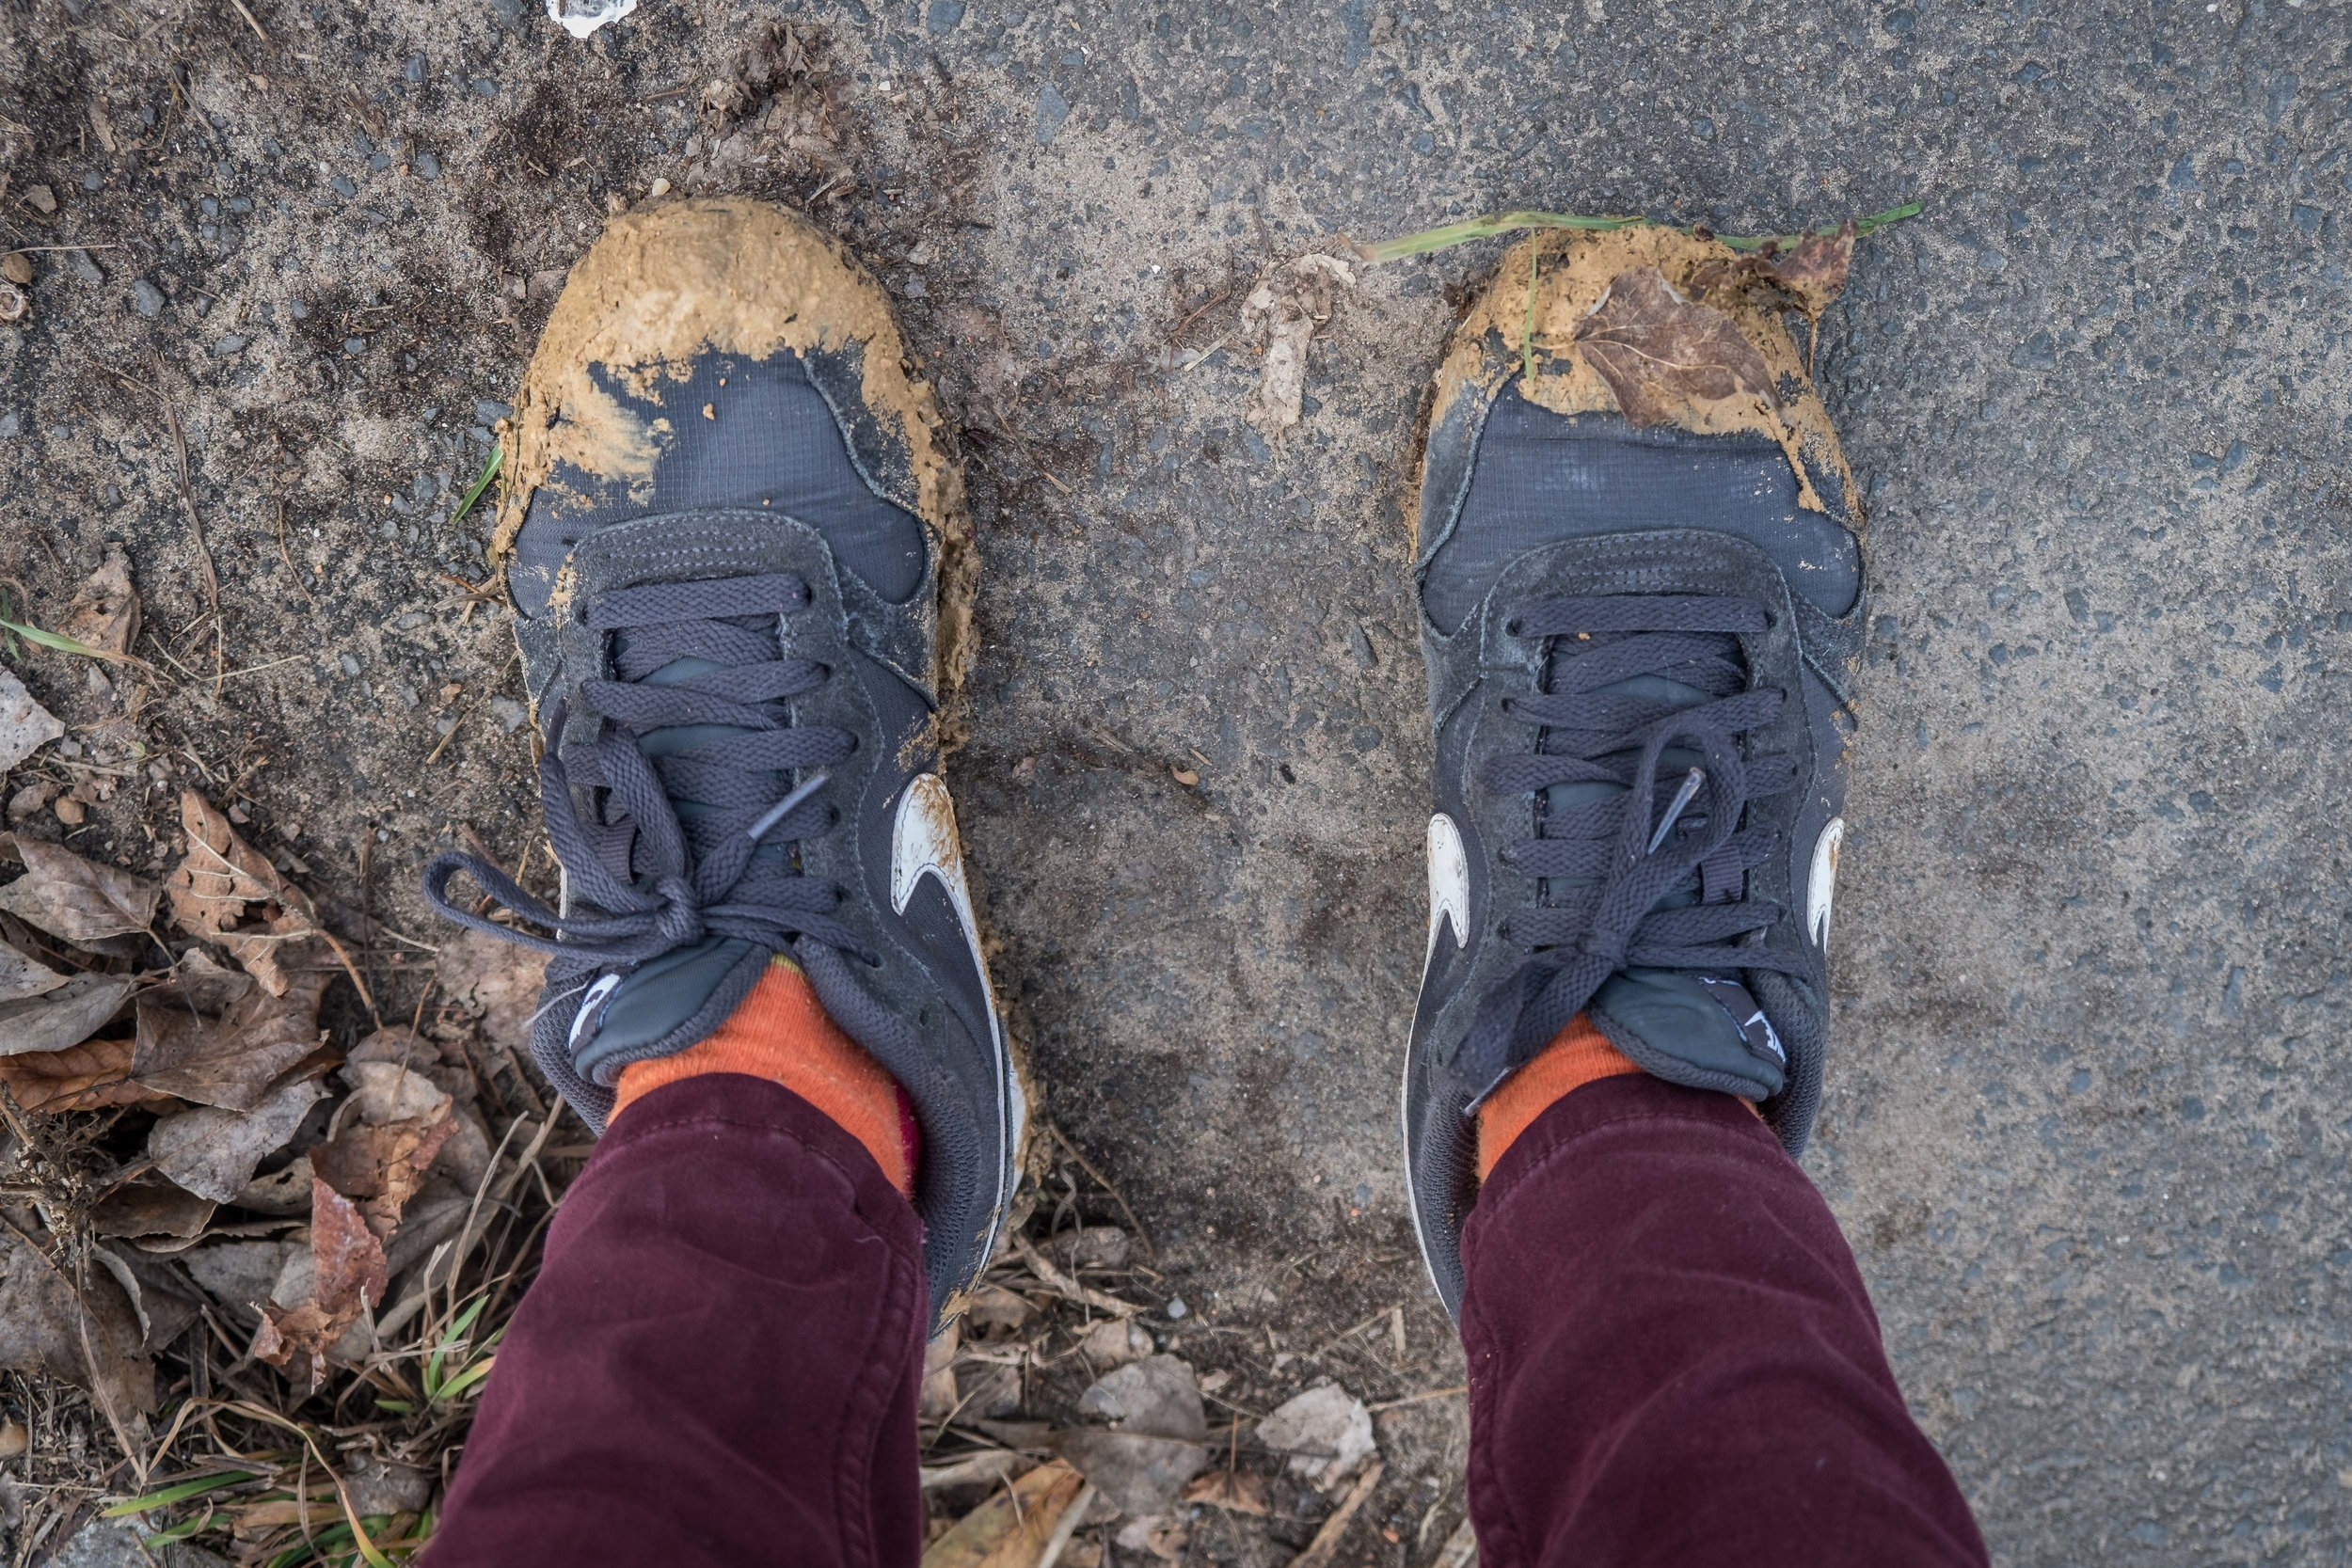 a week of rain + recent demolition = muddy shoes